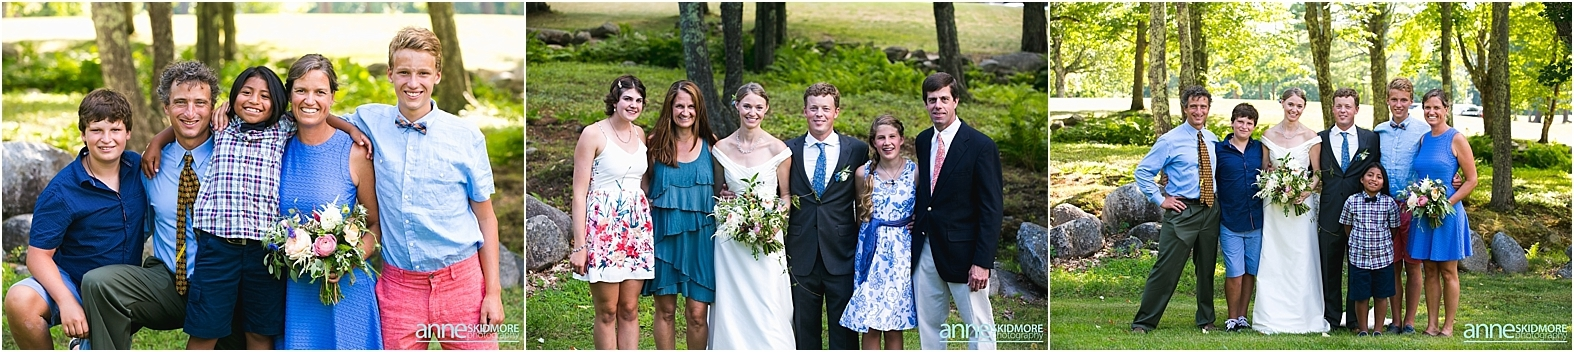 new_hampshire_wedding_photography_0047